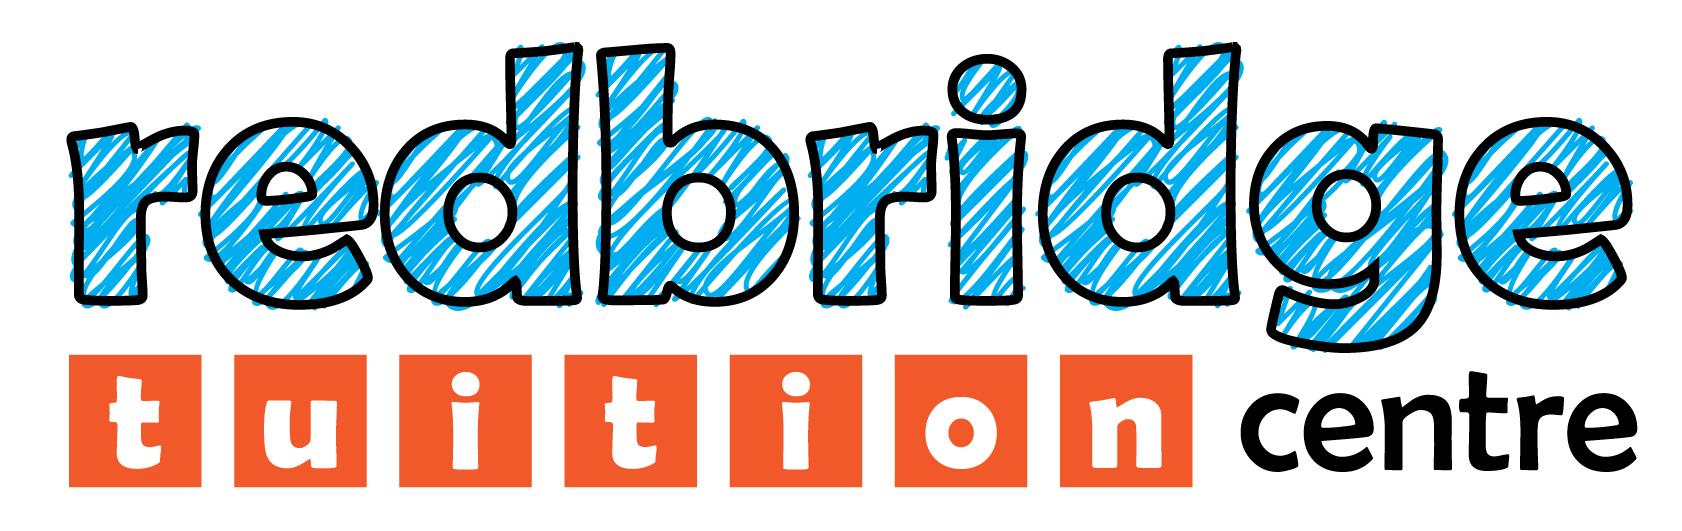 RedbridgeTuitionCentre-Logo